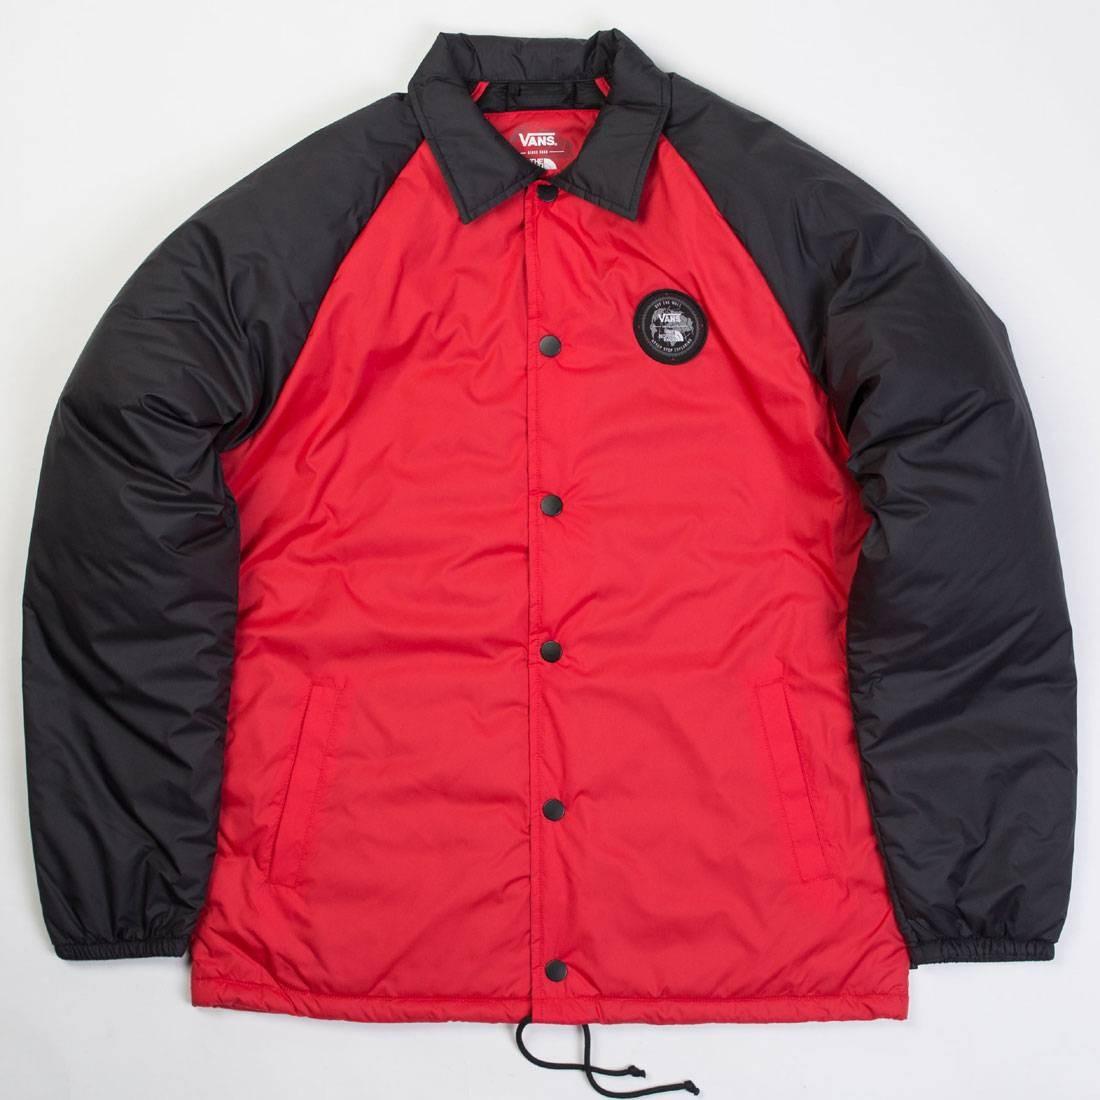 Vans x The North Face Men Torrey Jacket (red / black)